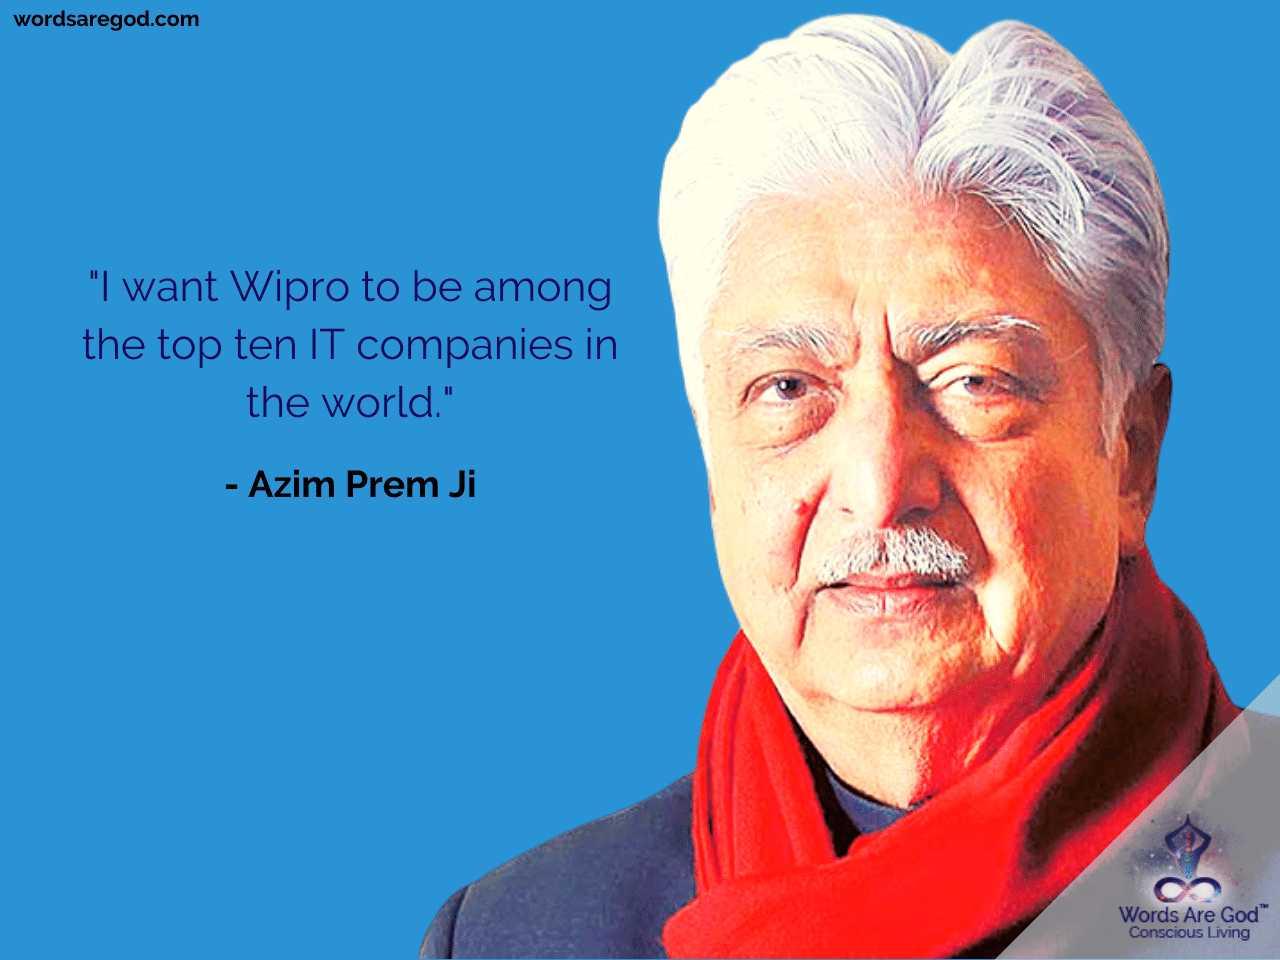 Azim Prem Ji Motivational Quote